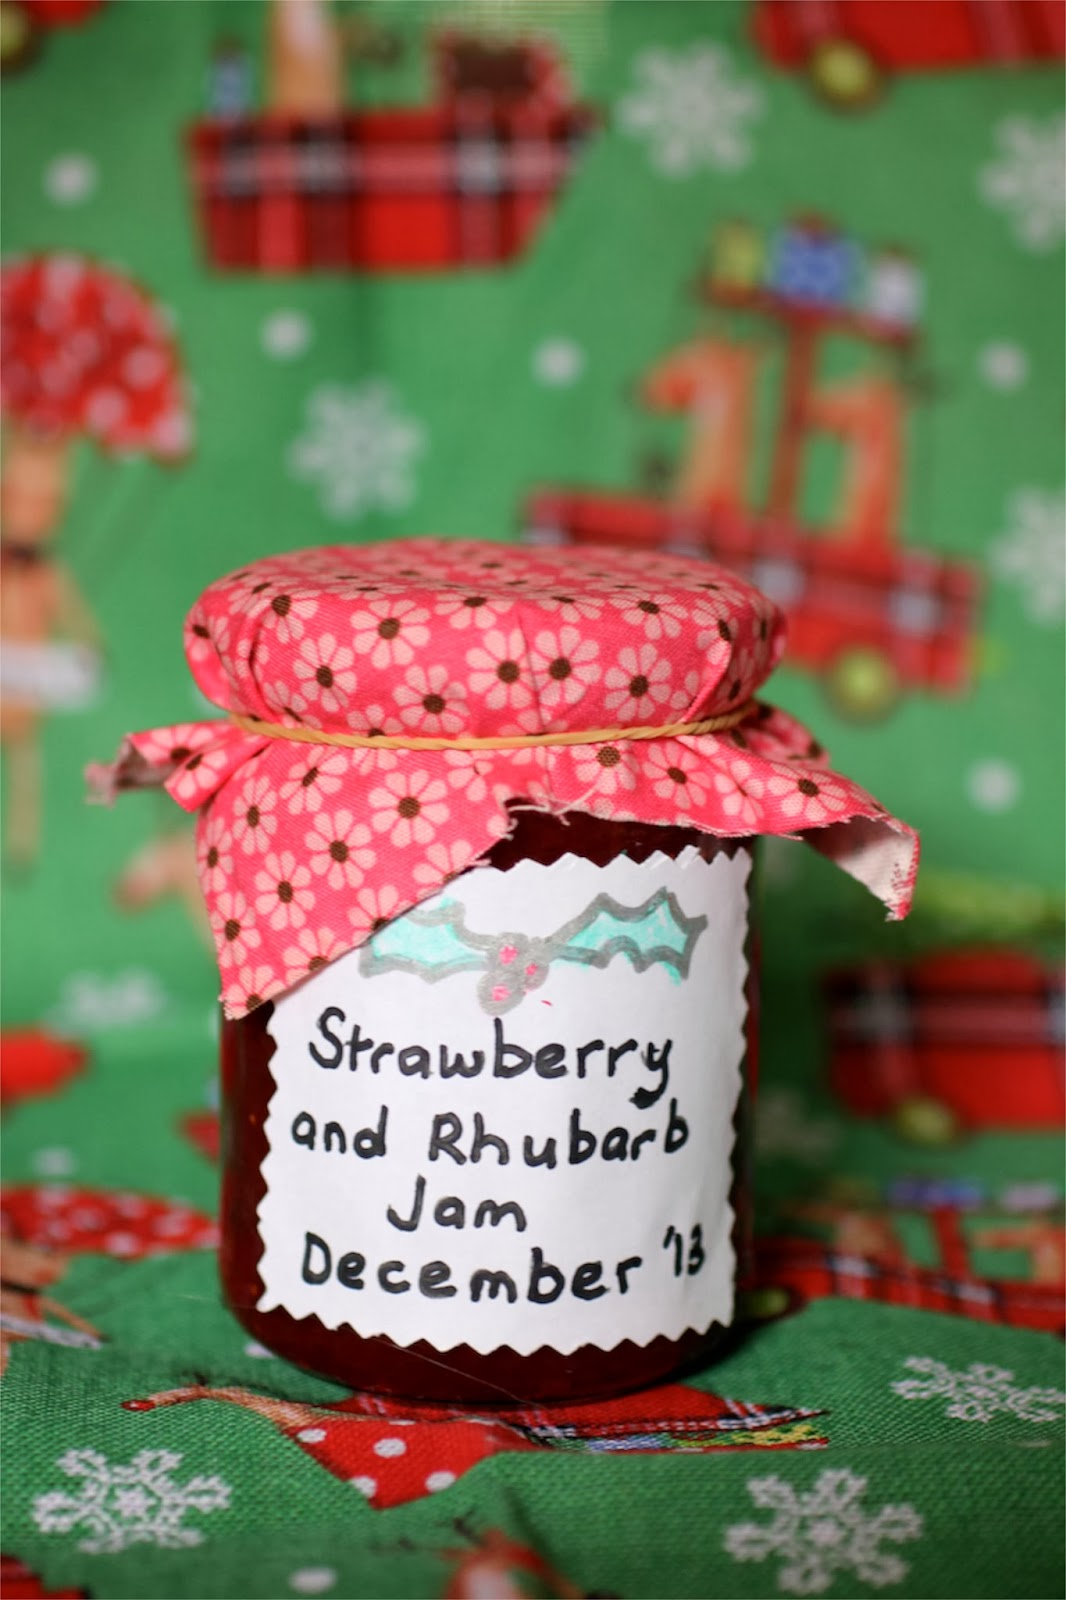 Green Gourmet Giraffe: 10 Foodie Christmas Gift Ideas